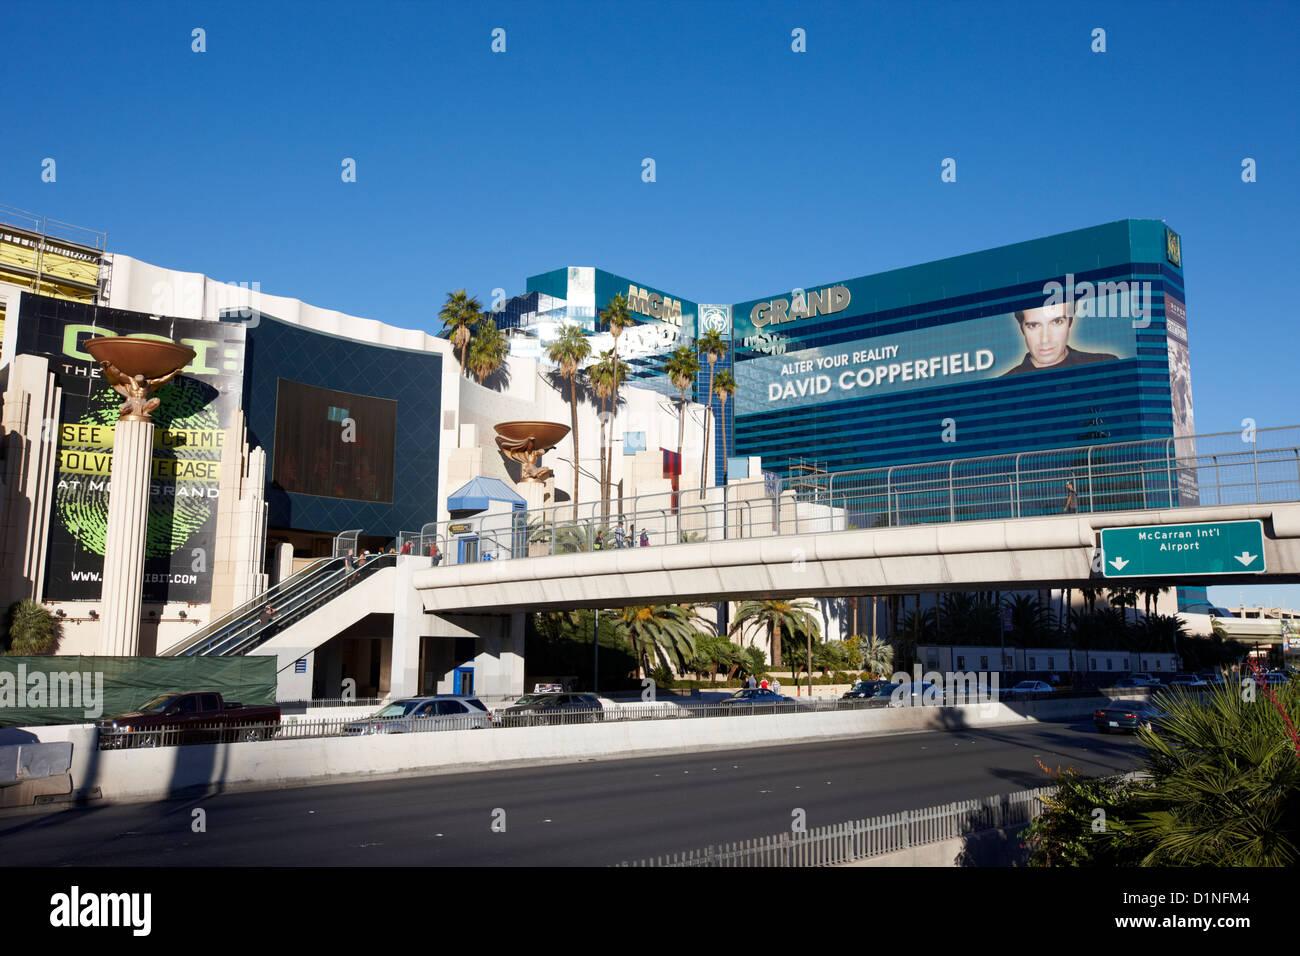 the mgm grand resort hotel and casino Las Vegas Nevada USA - Stock Image